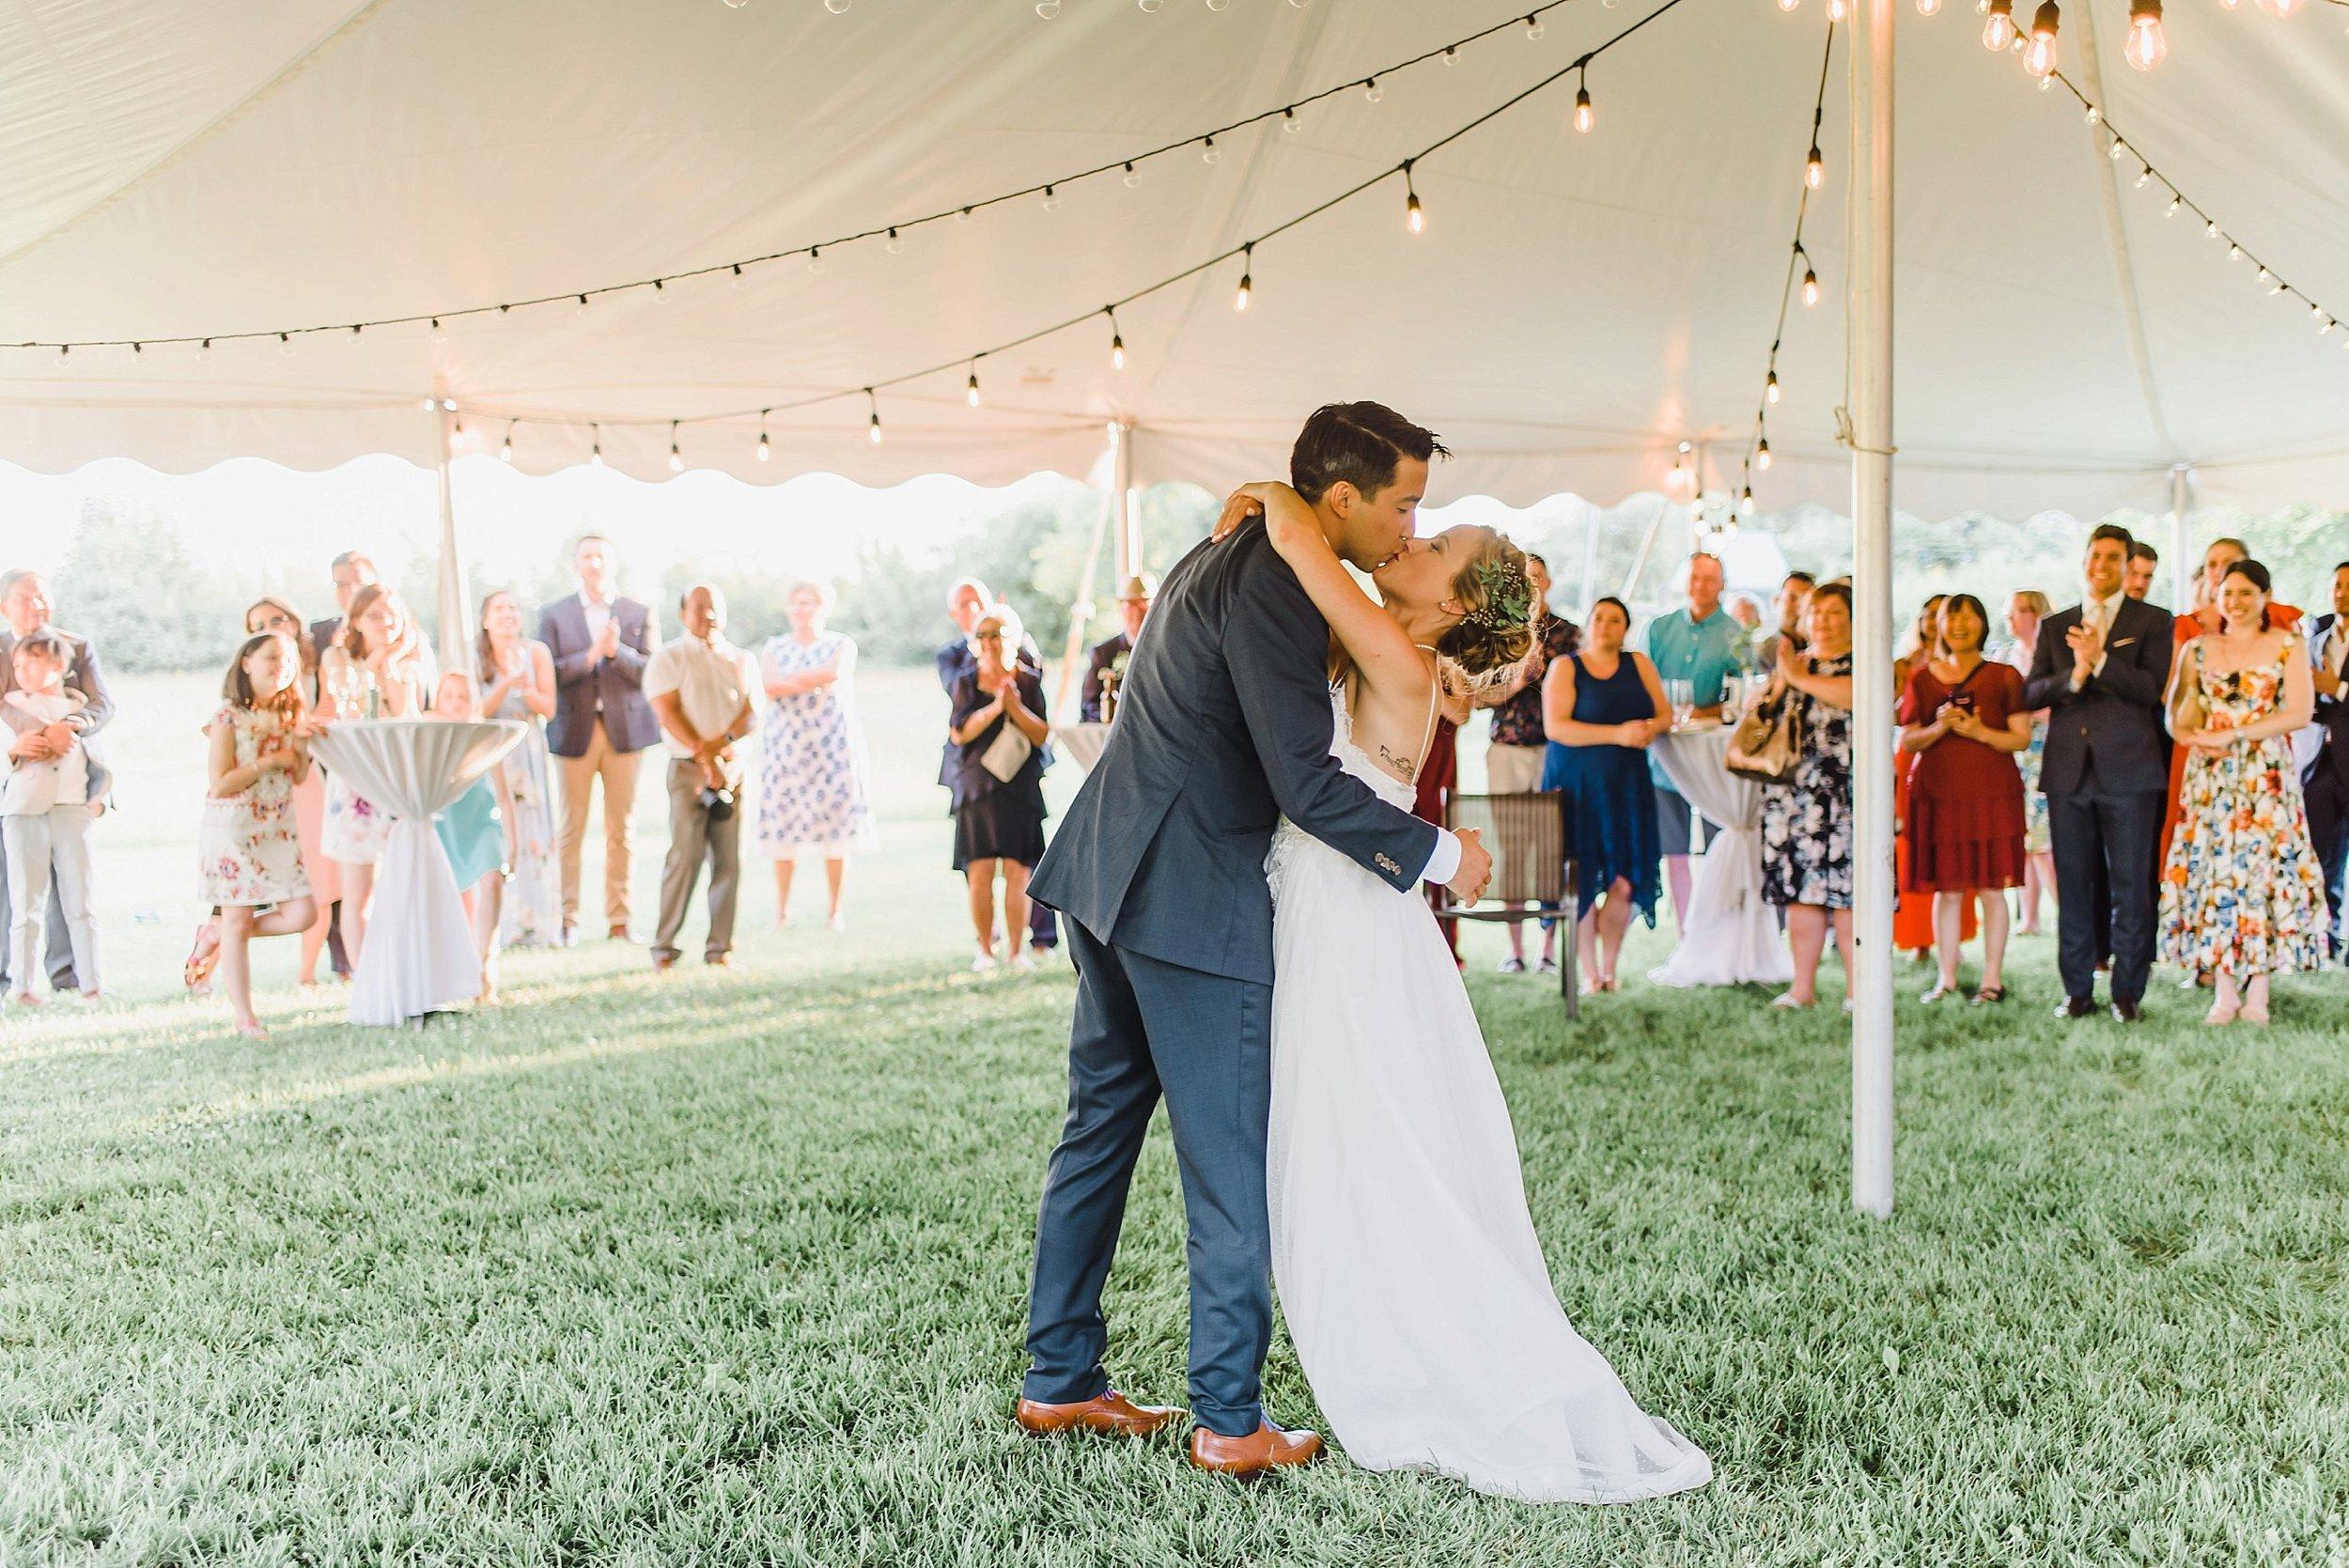 light airy indie fine art ottawa wedding photographer | Ali and Batoul Photography_0895.jpg